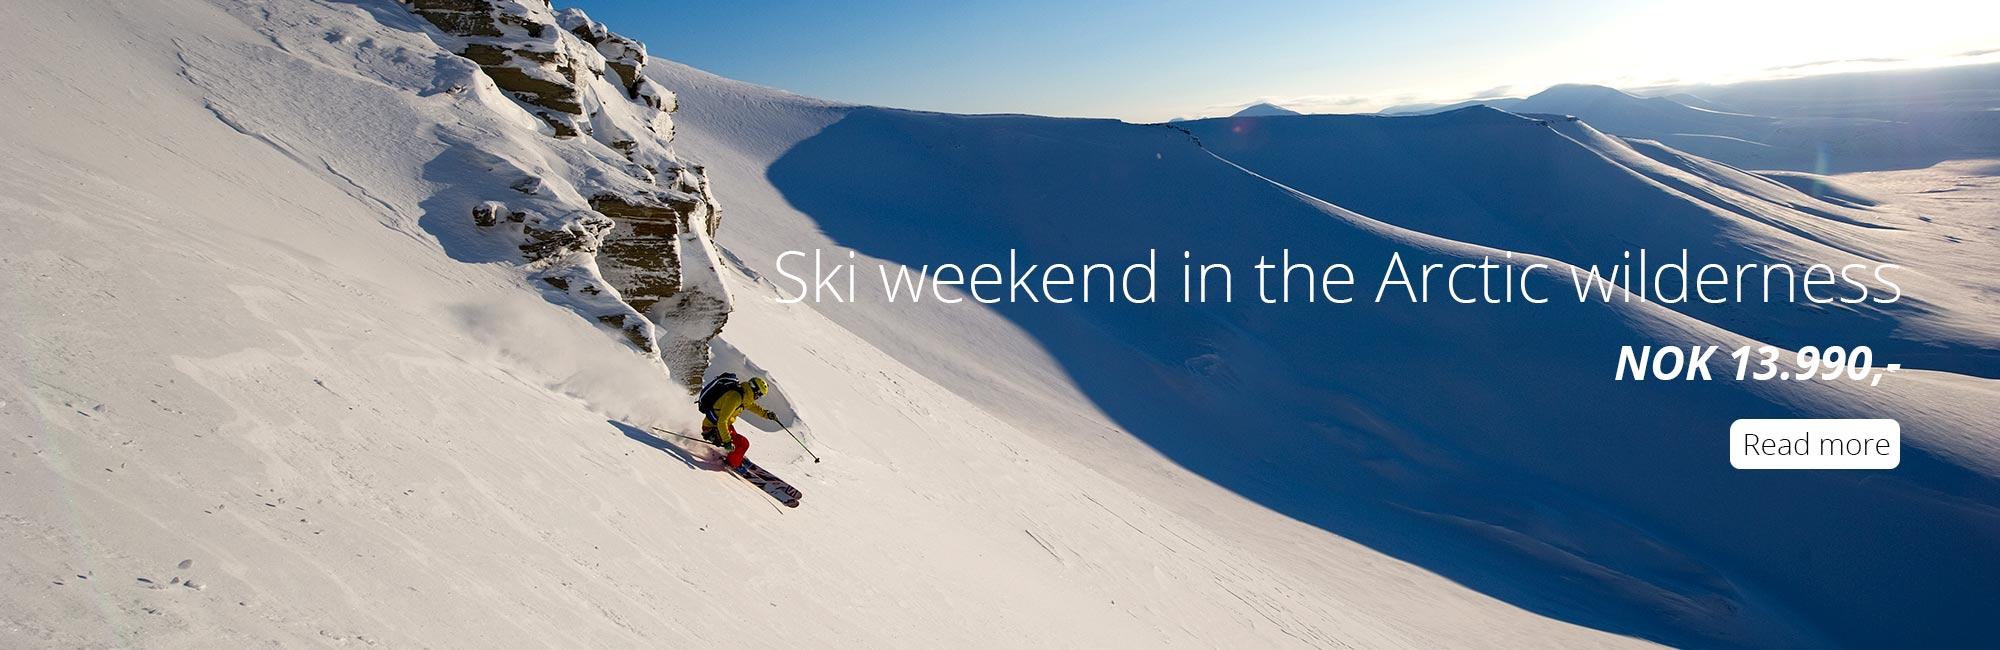 Ski weekend on Svalbard